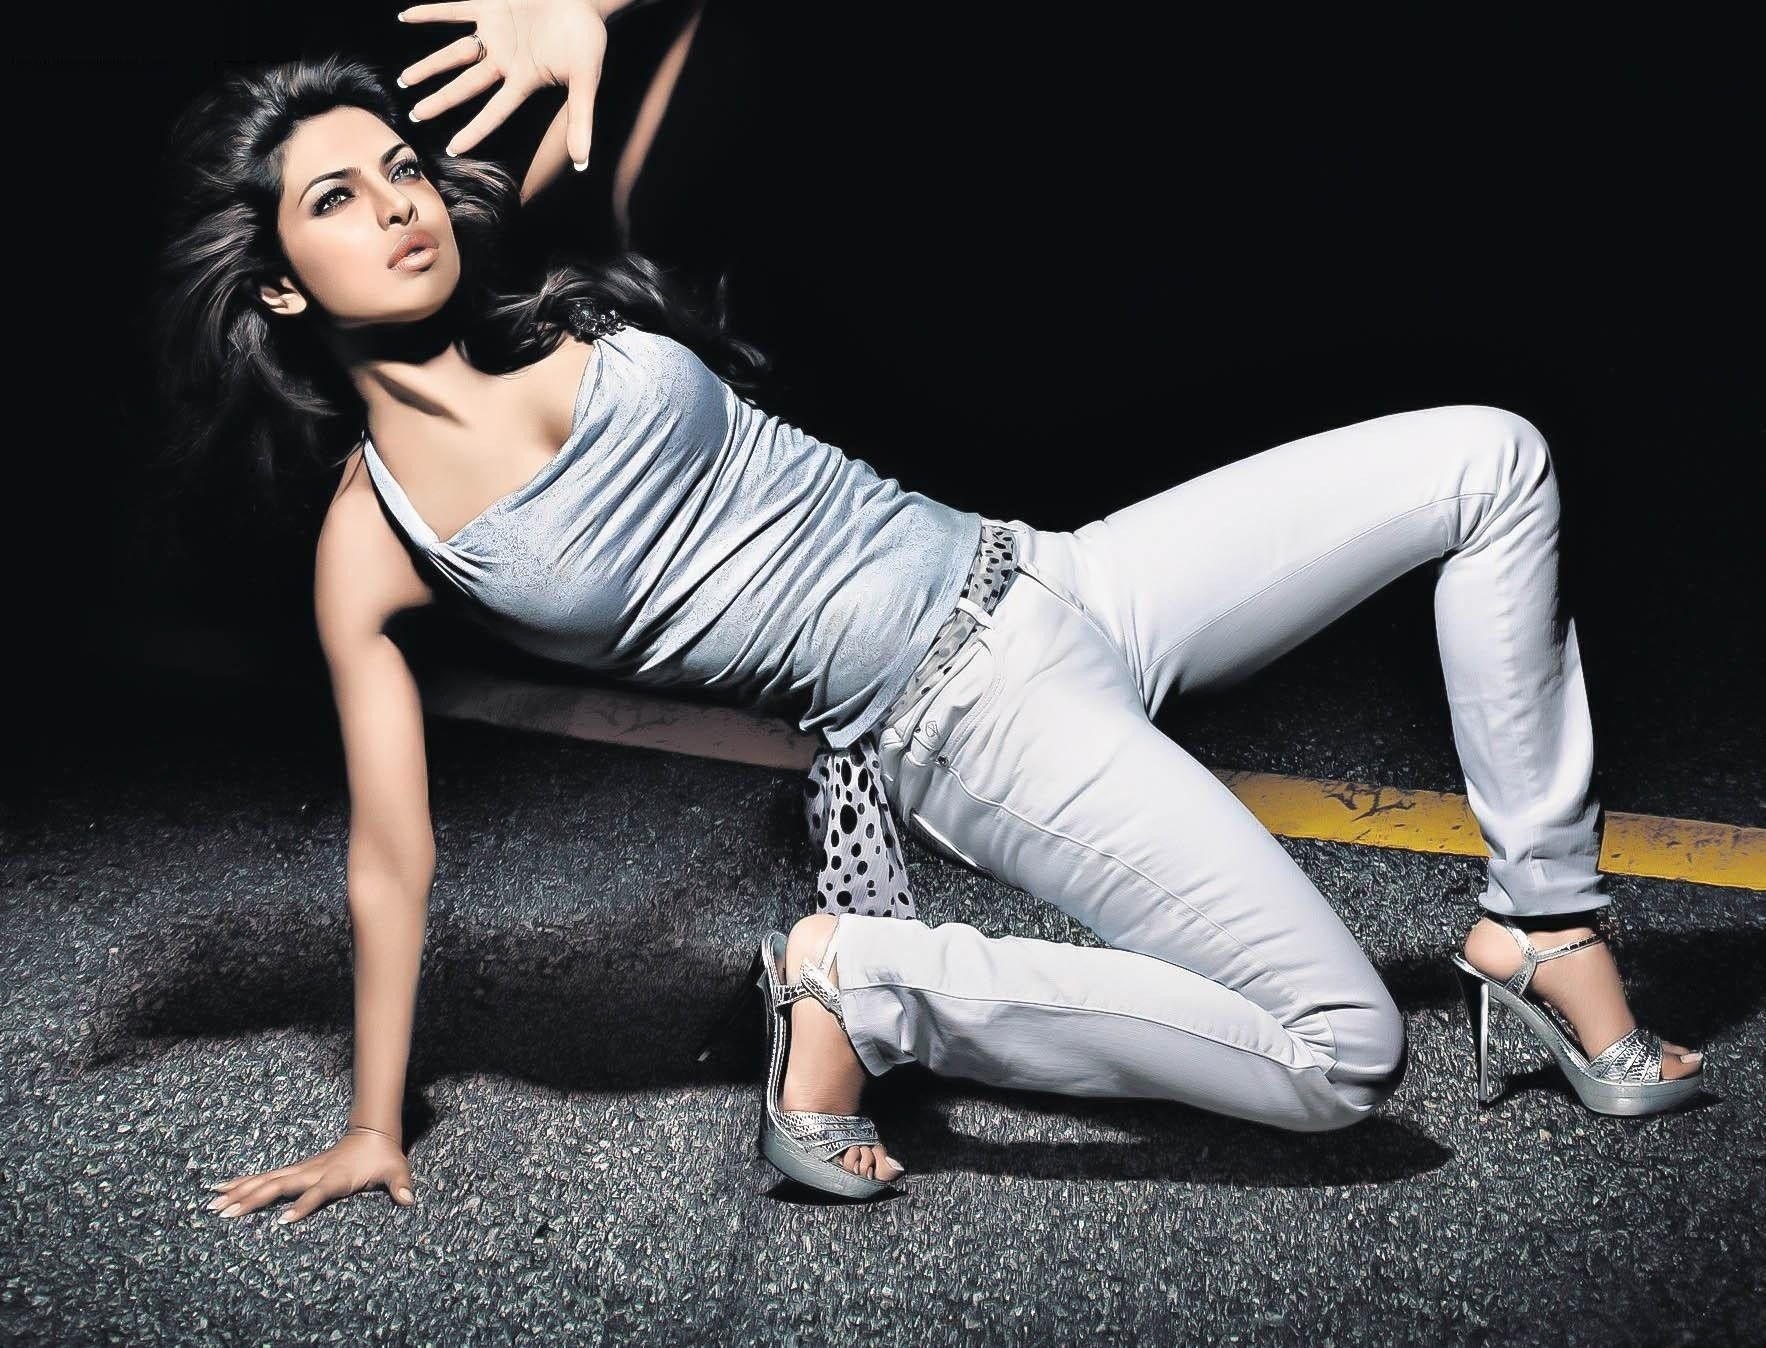 HD Quality Wallpaper of Beauty Queen Priyanka Chopra Best Path